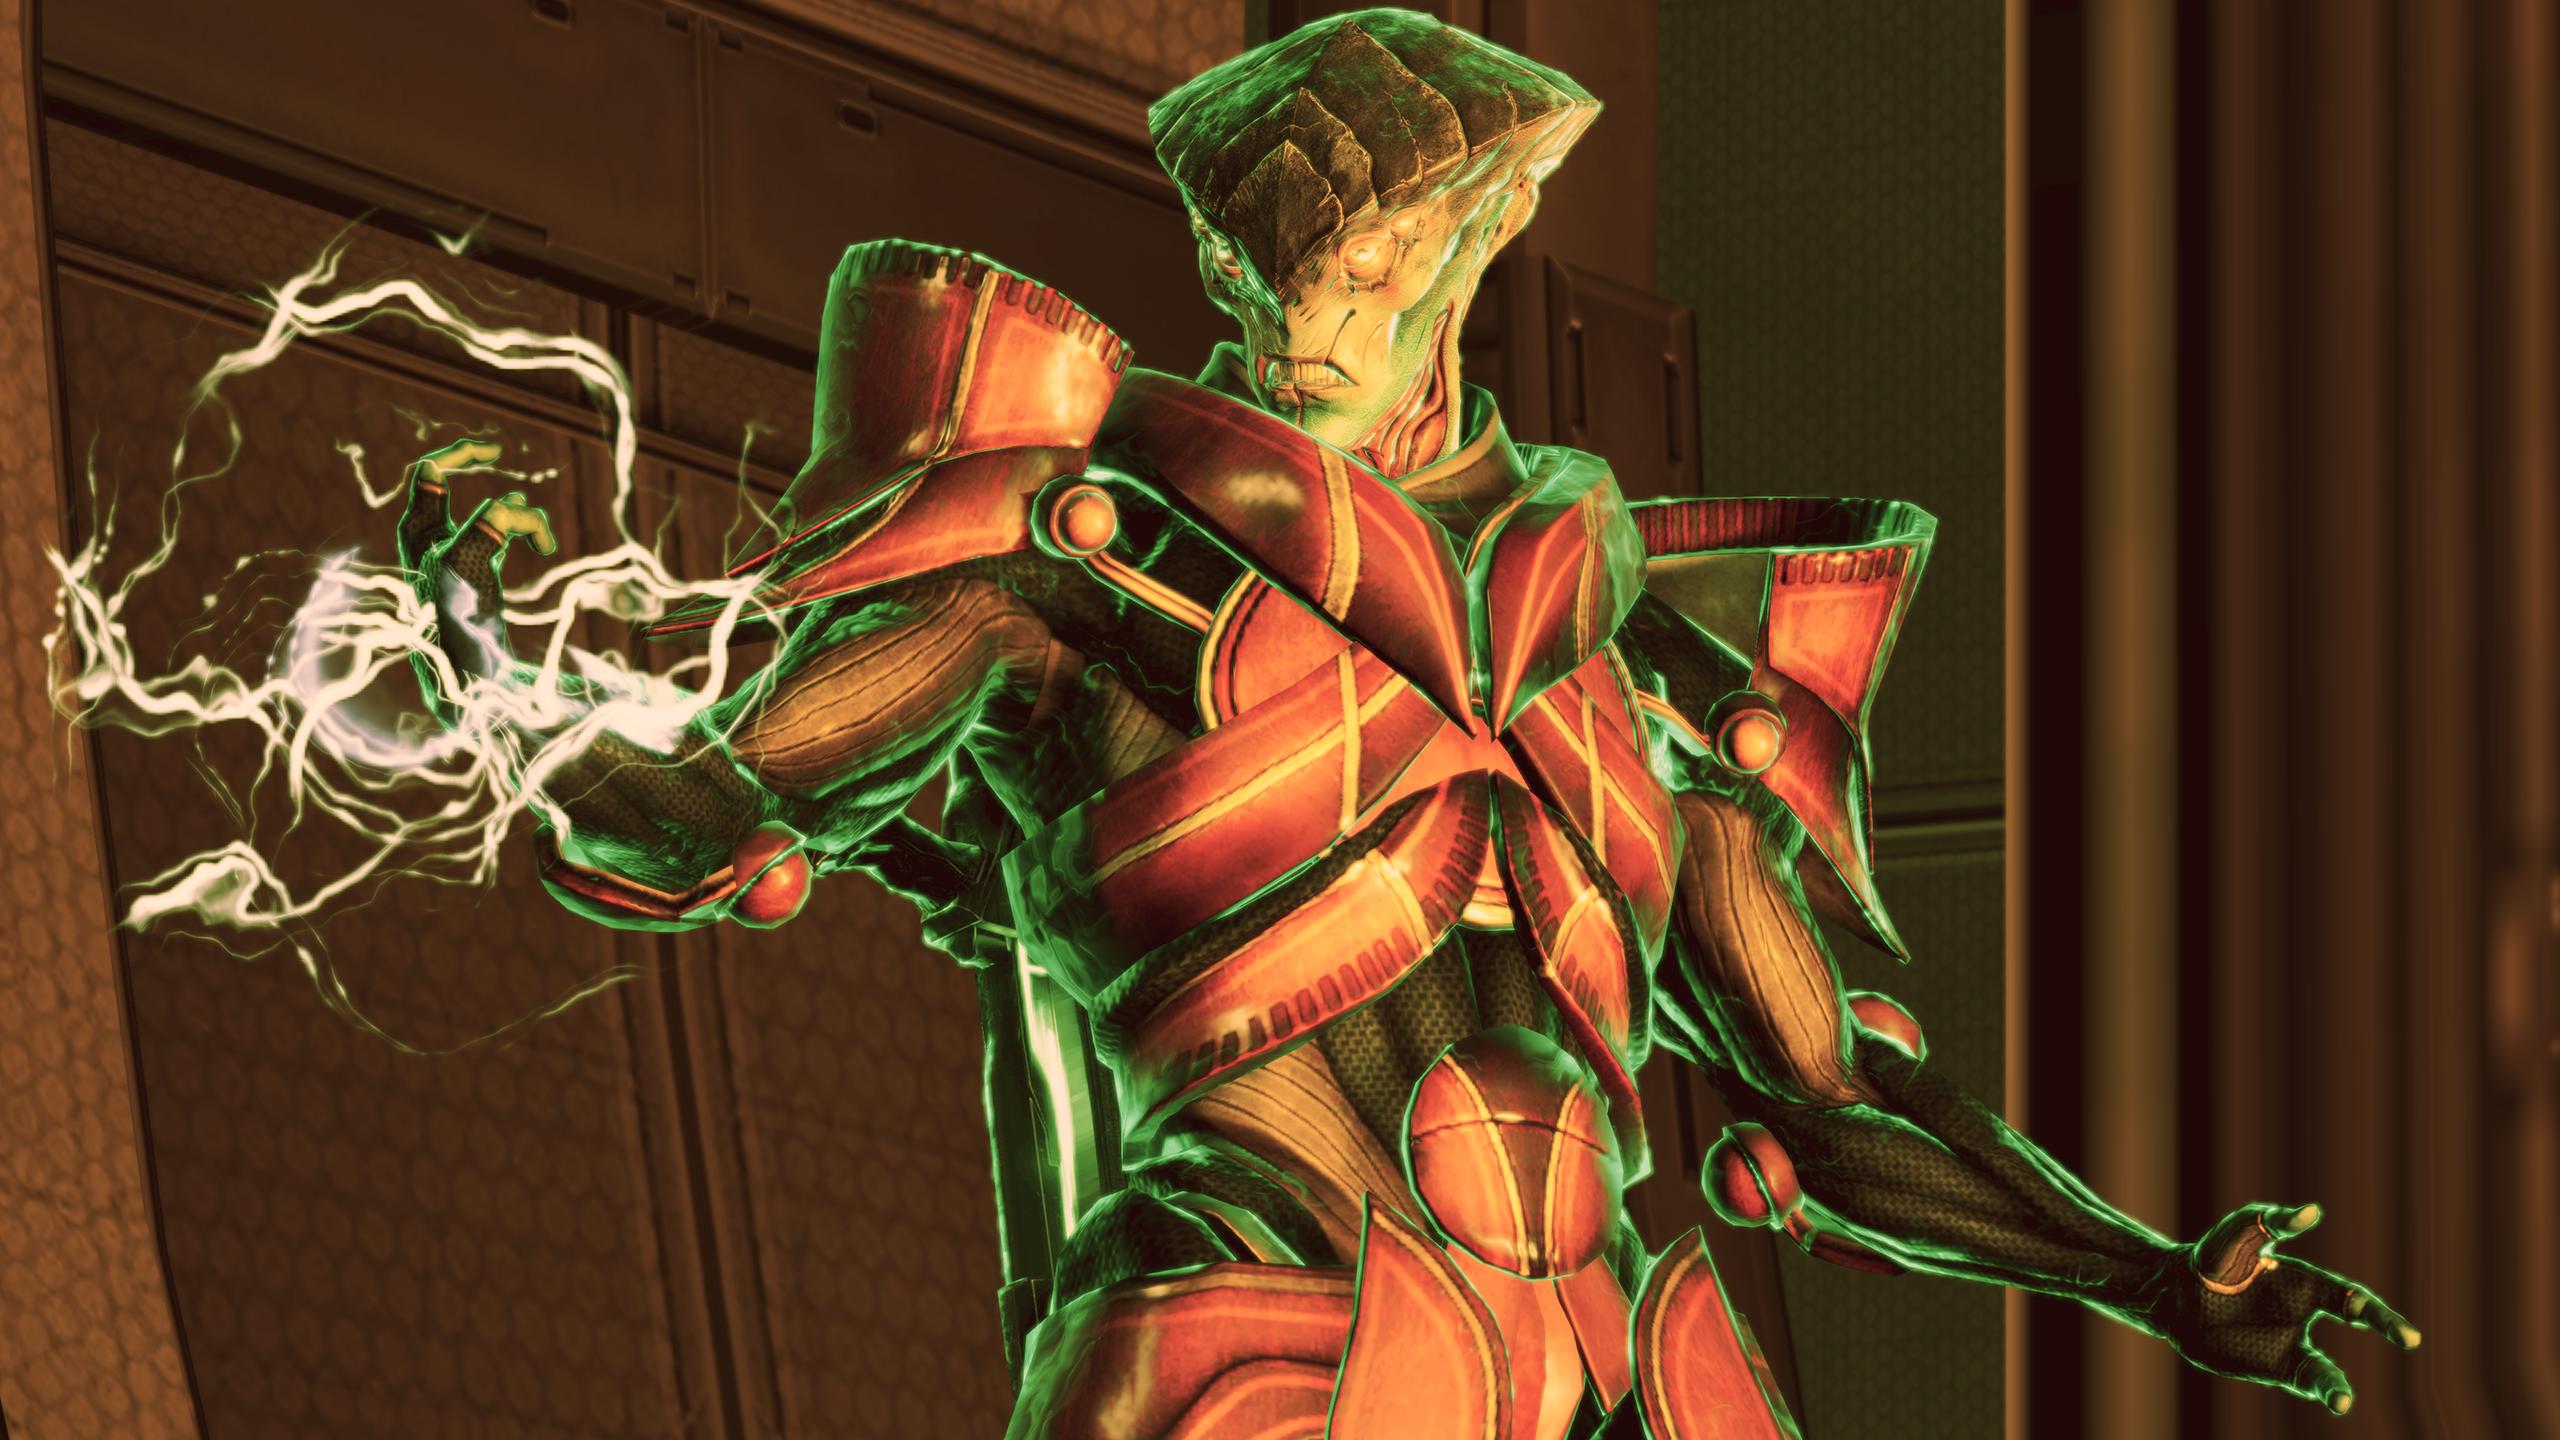 Prothean | Mass Effect Wiki | FANDOM powered by Wikia